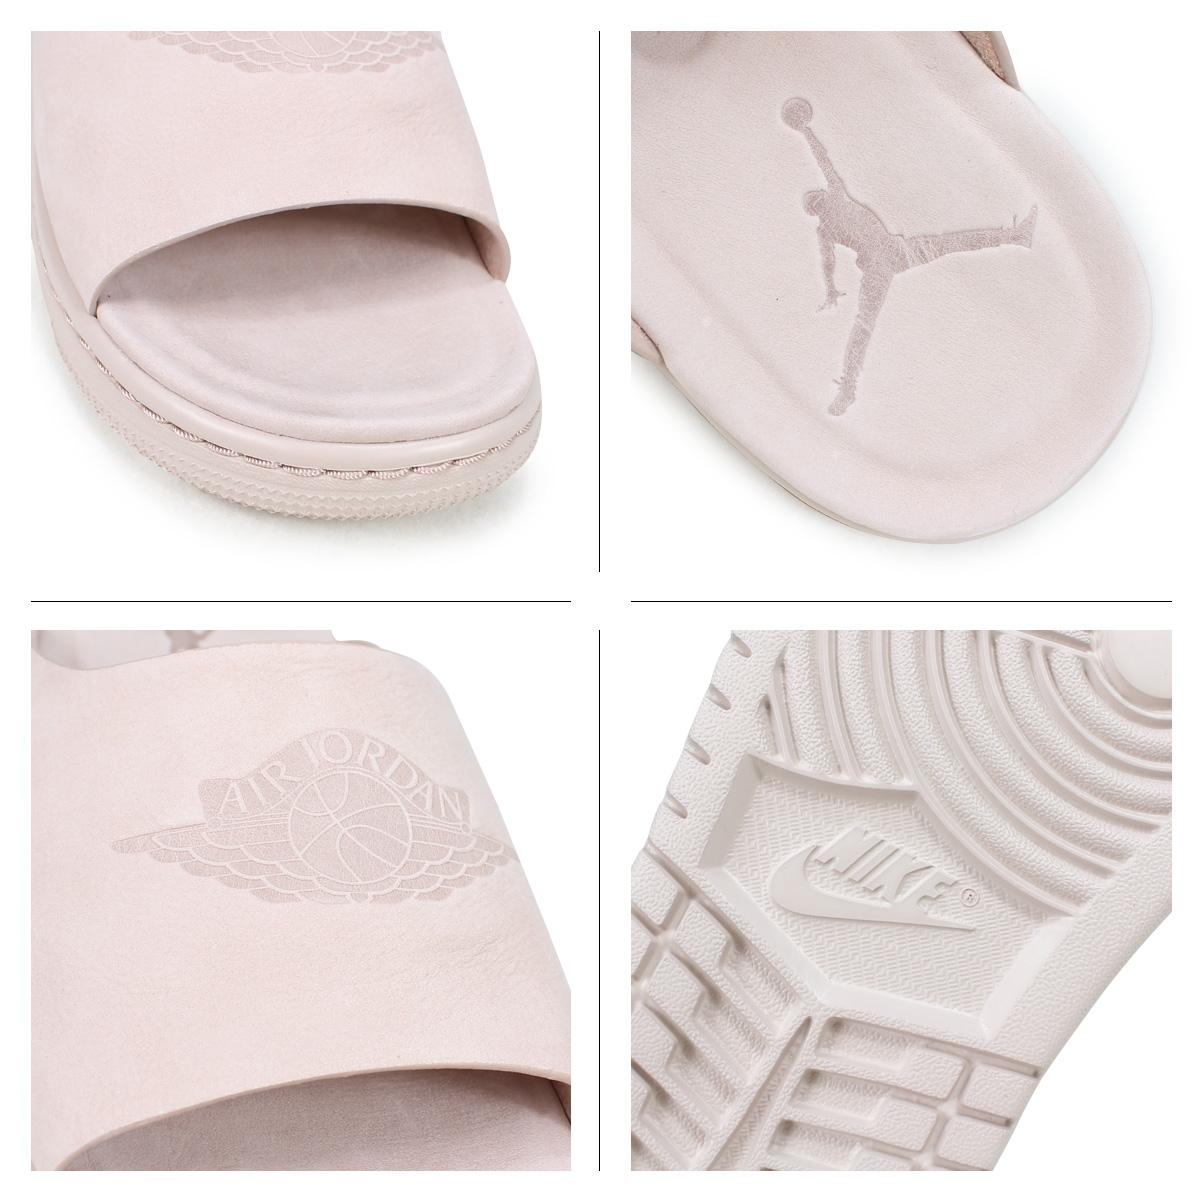 huge selection of 6ce58 0982d ... NIKE WMNS JORDAN MODERO 1 Nike sandals Jordan shower sandals sports  Lady s men AO9919-200 ...